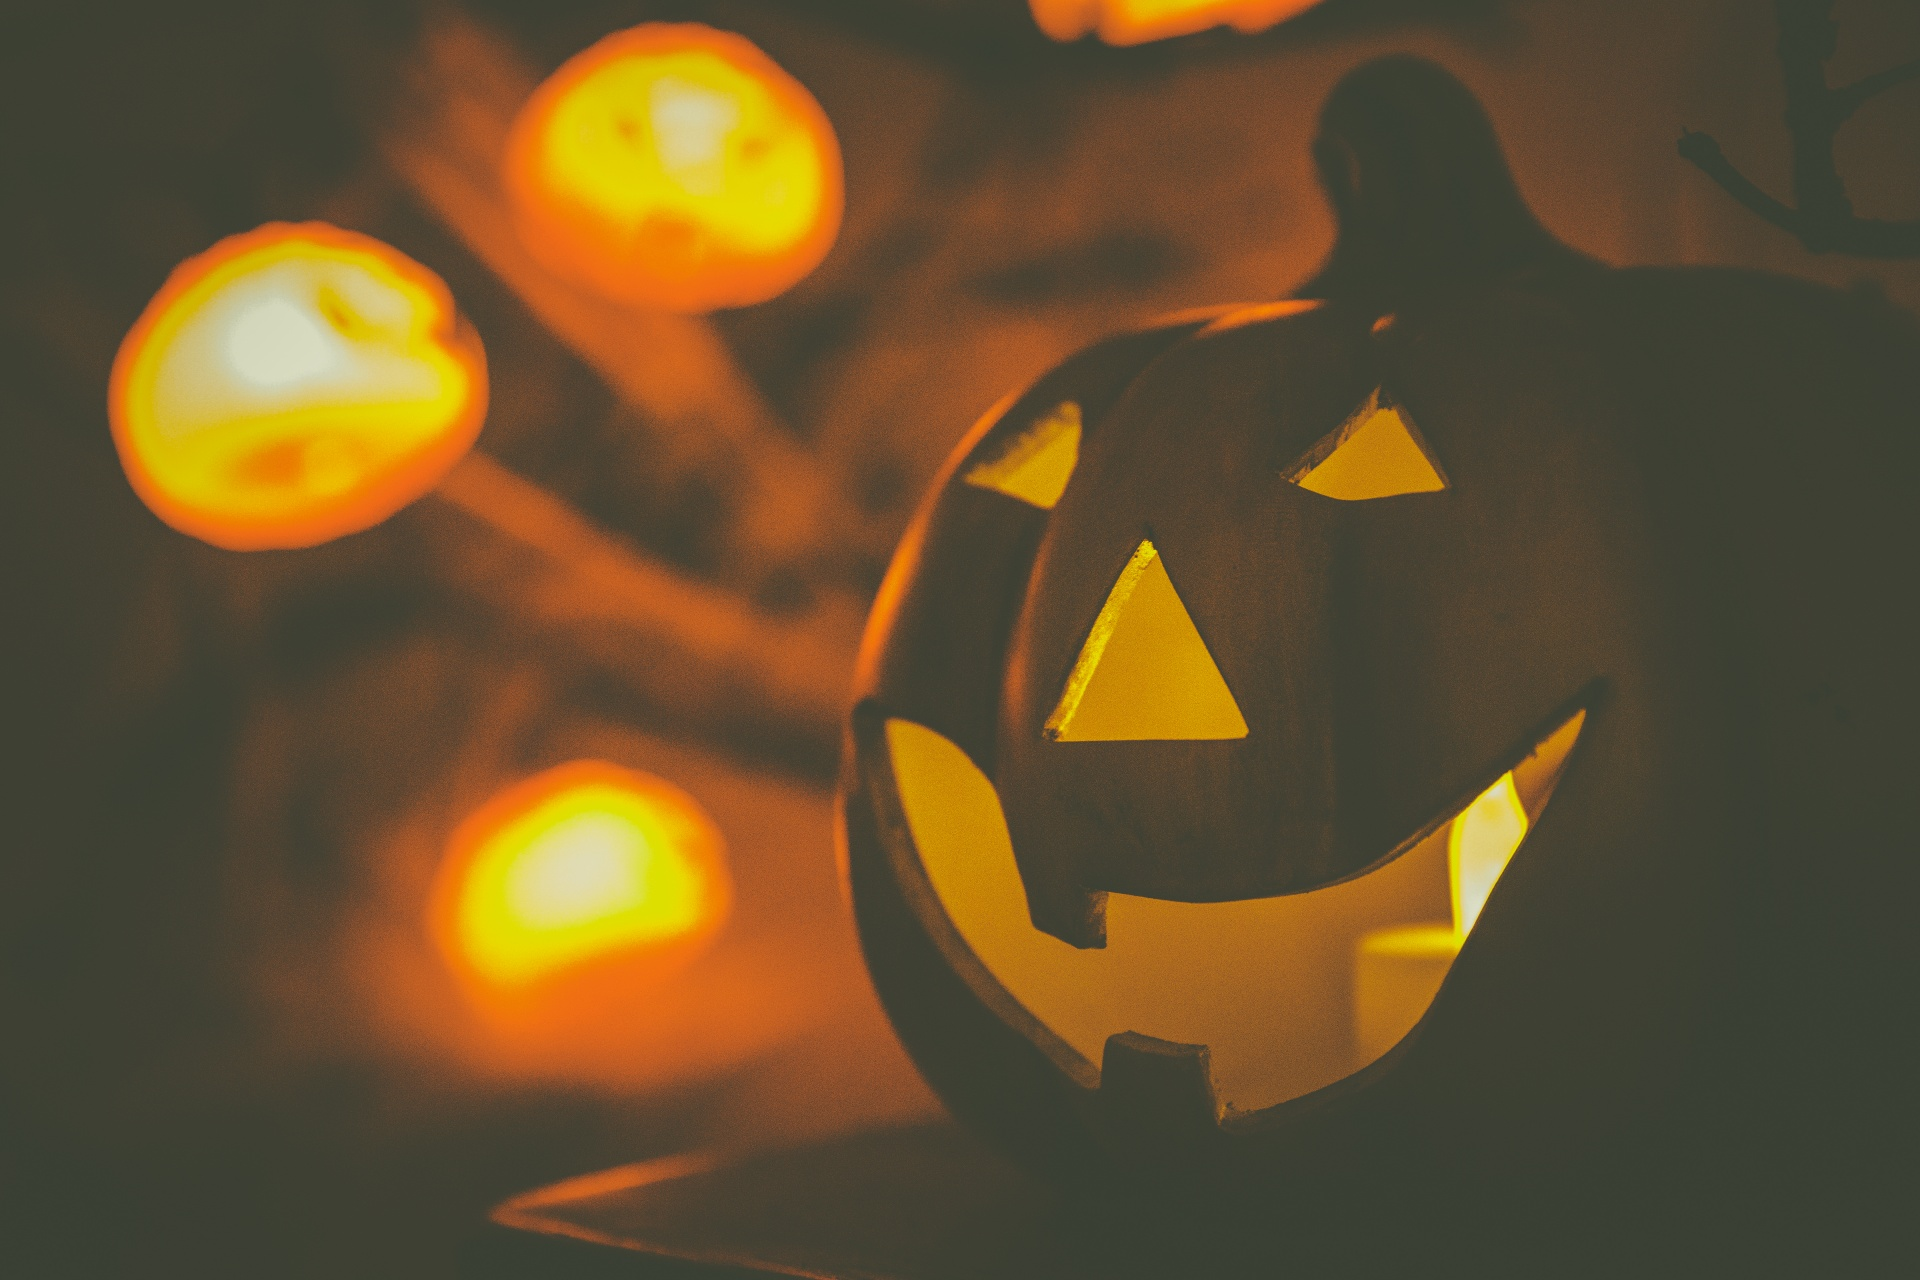 glowing-halloween-pumpkin-1534411911ywk